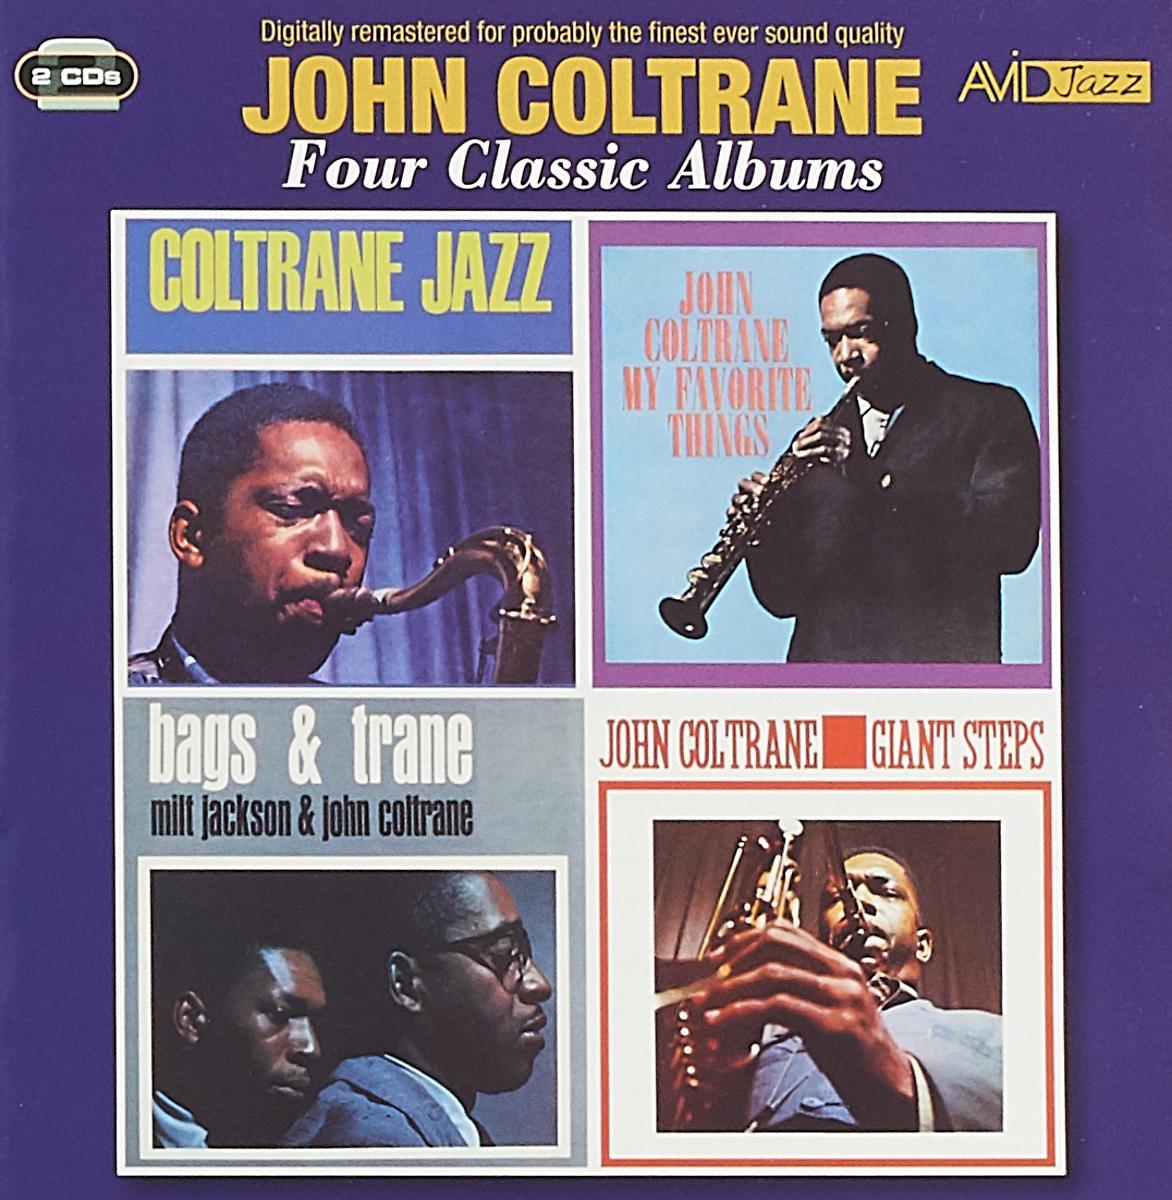 Джон Колтрейн John Coltrane. Four Classic Albums (2 CD) джон колтрейн john coltrane giant steps the best of the early years 10 cd